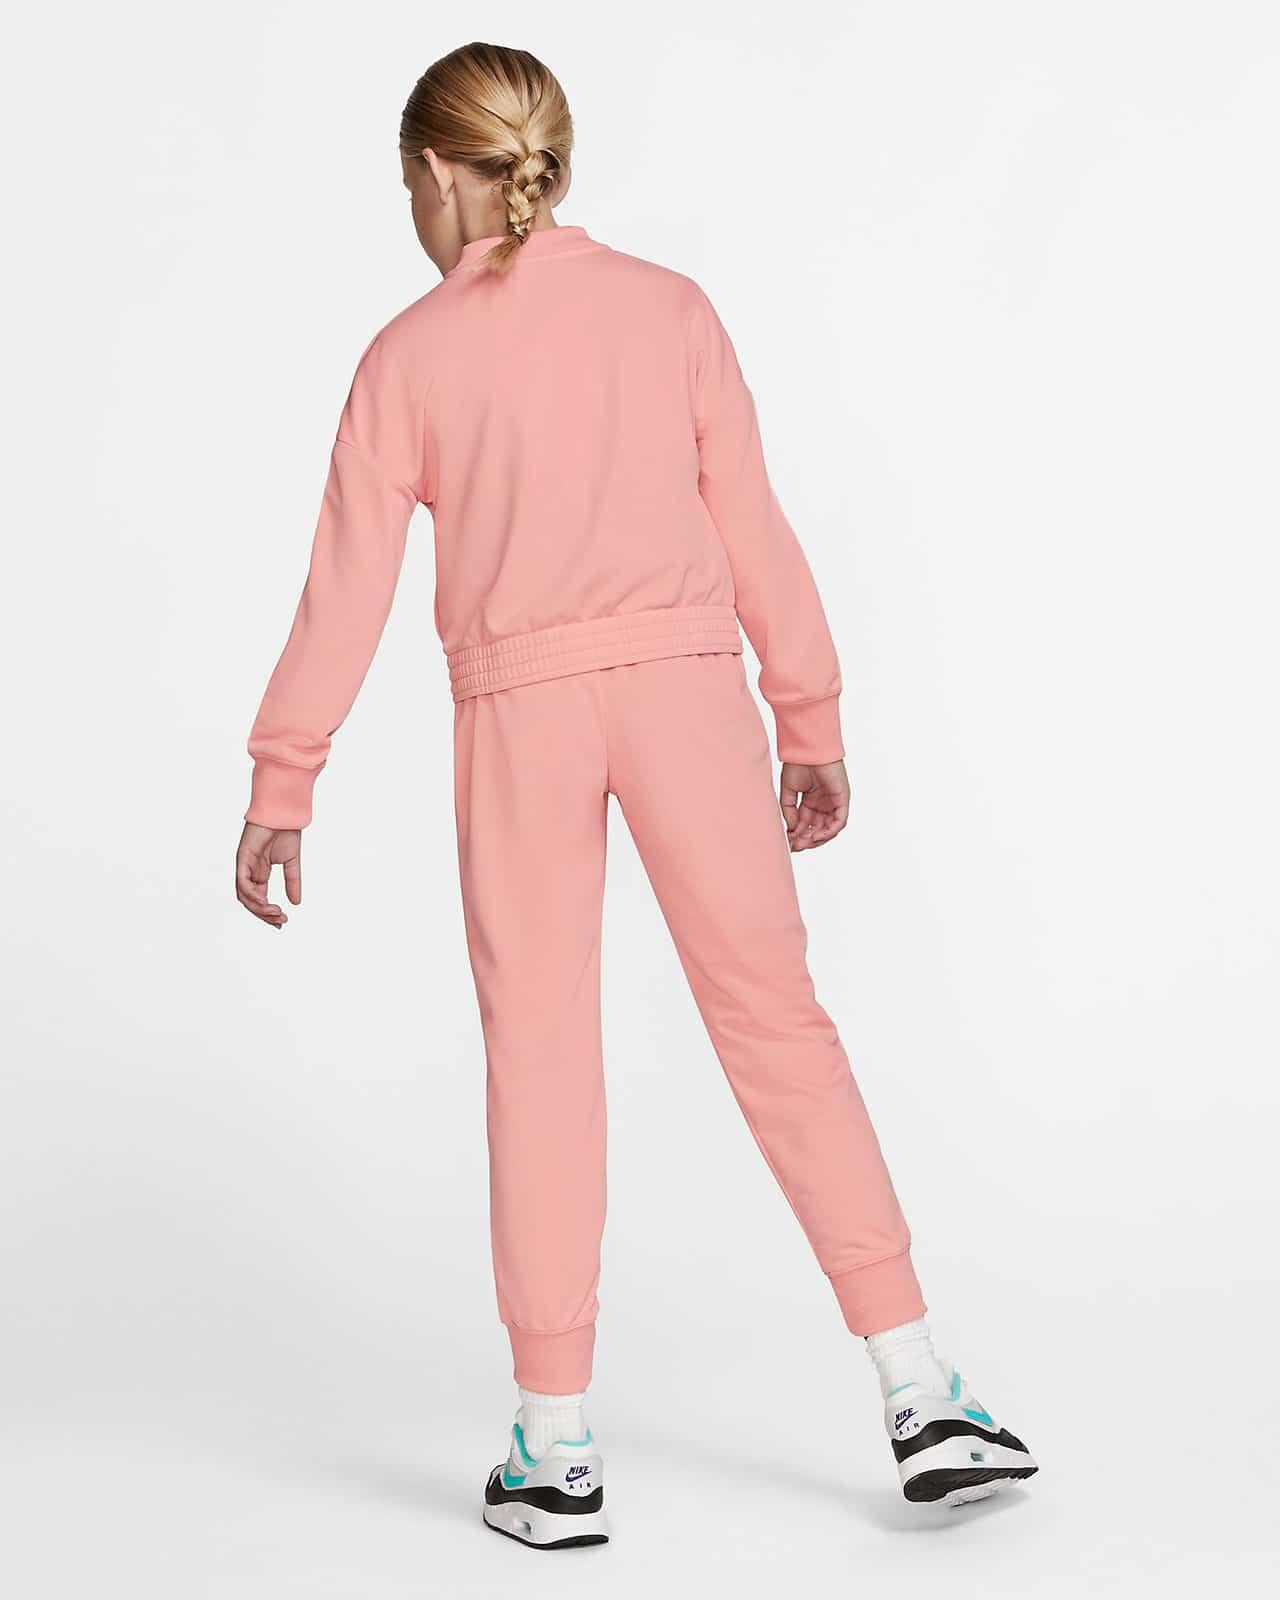 Спортивный костюм Nike - вид сзади